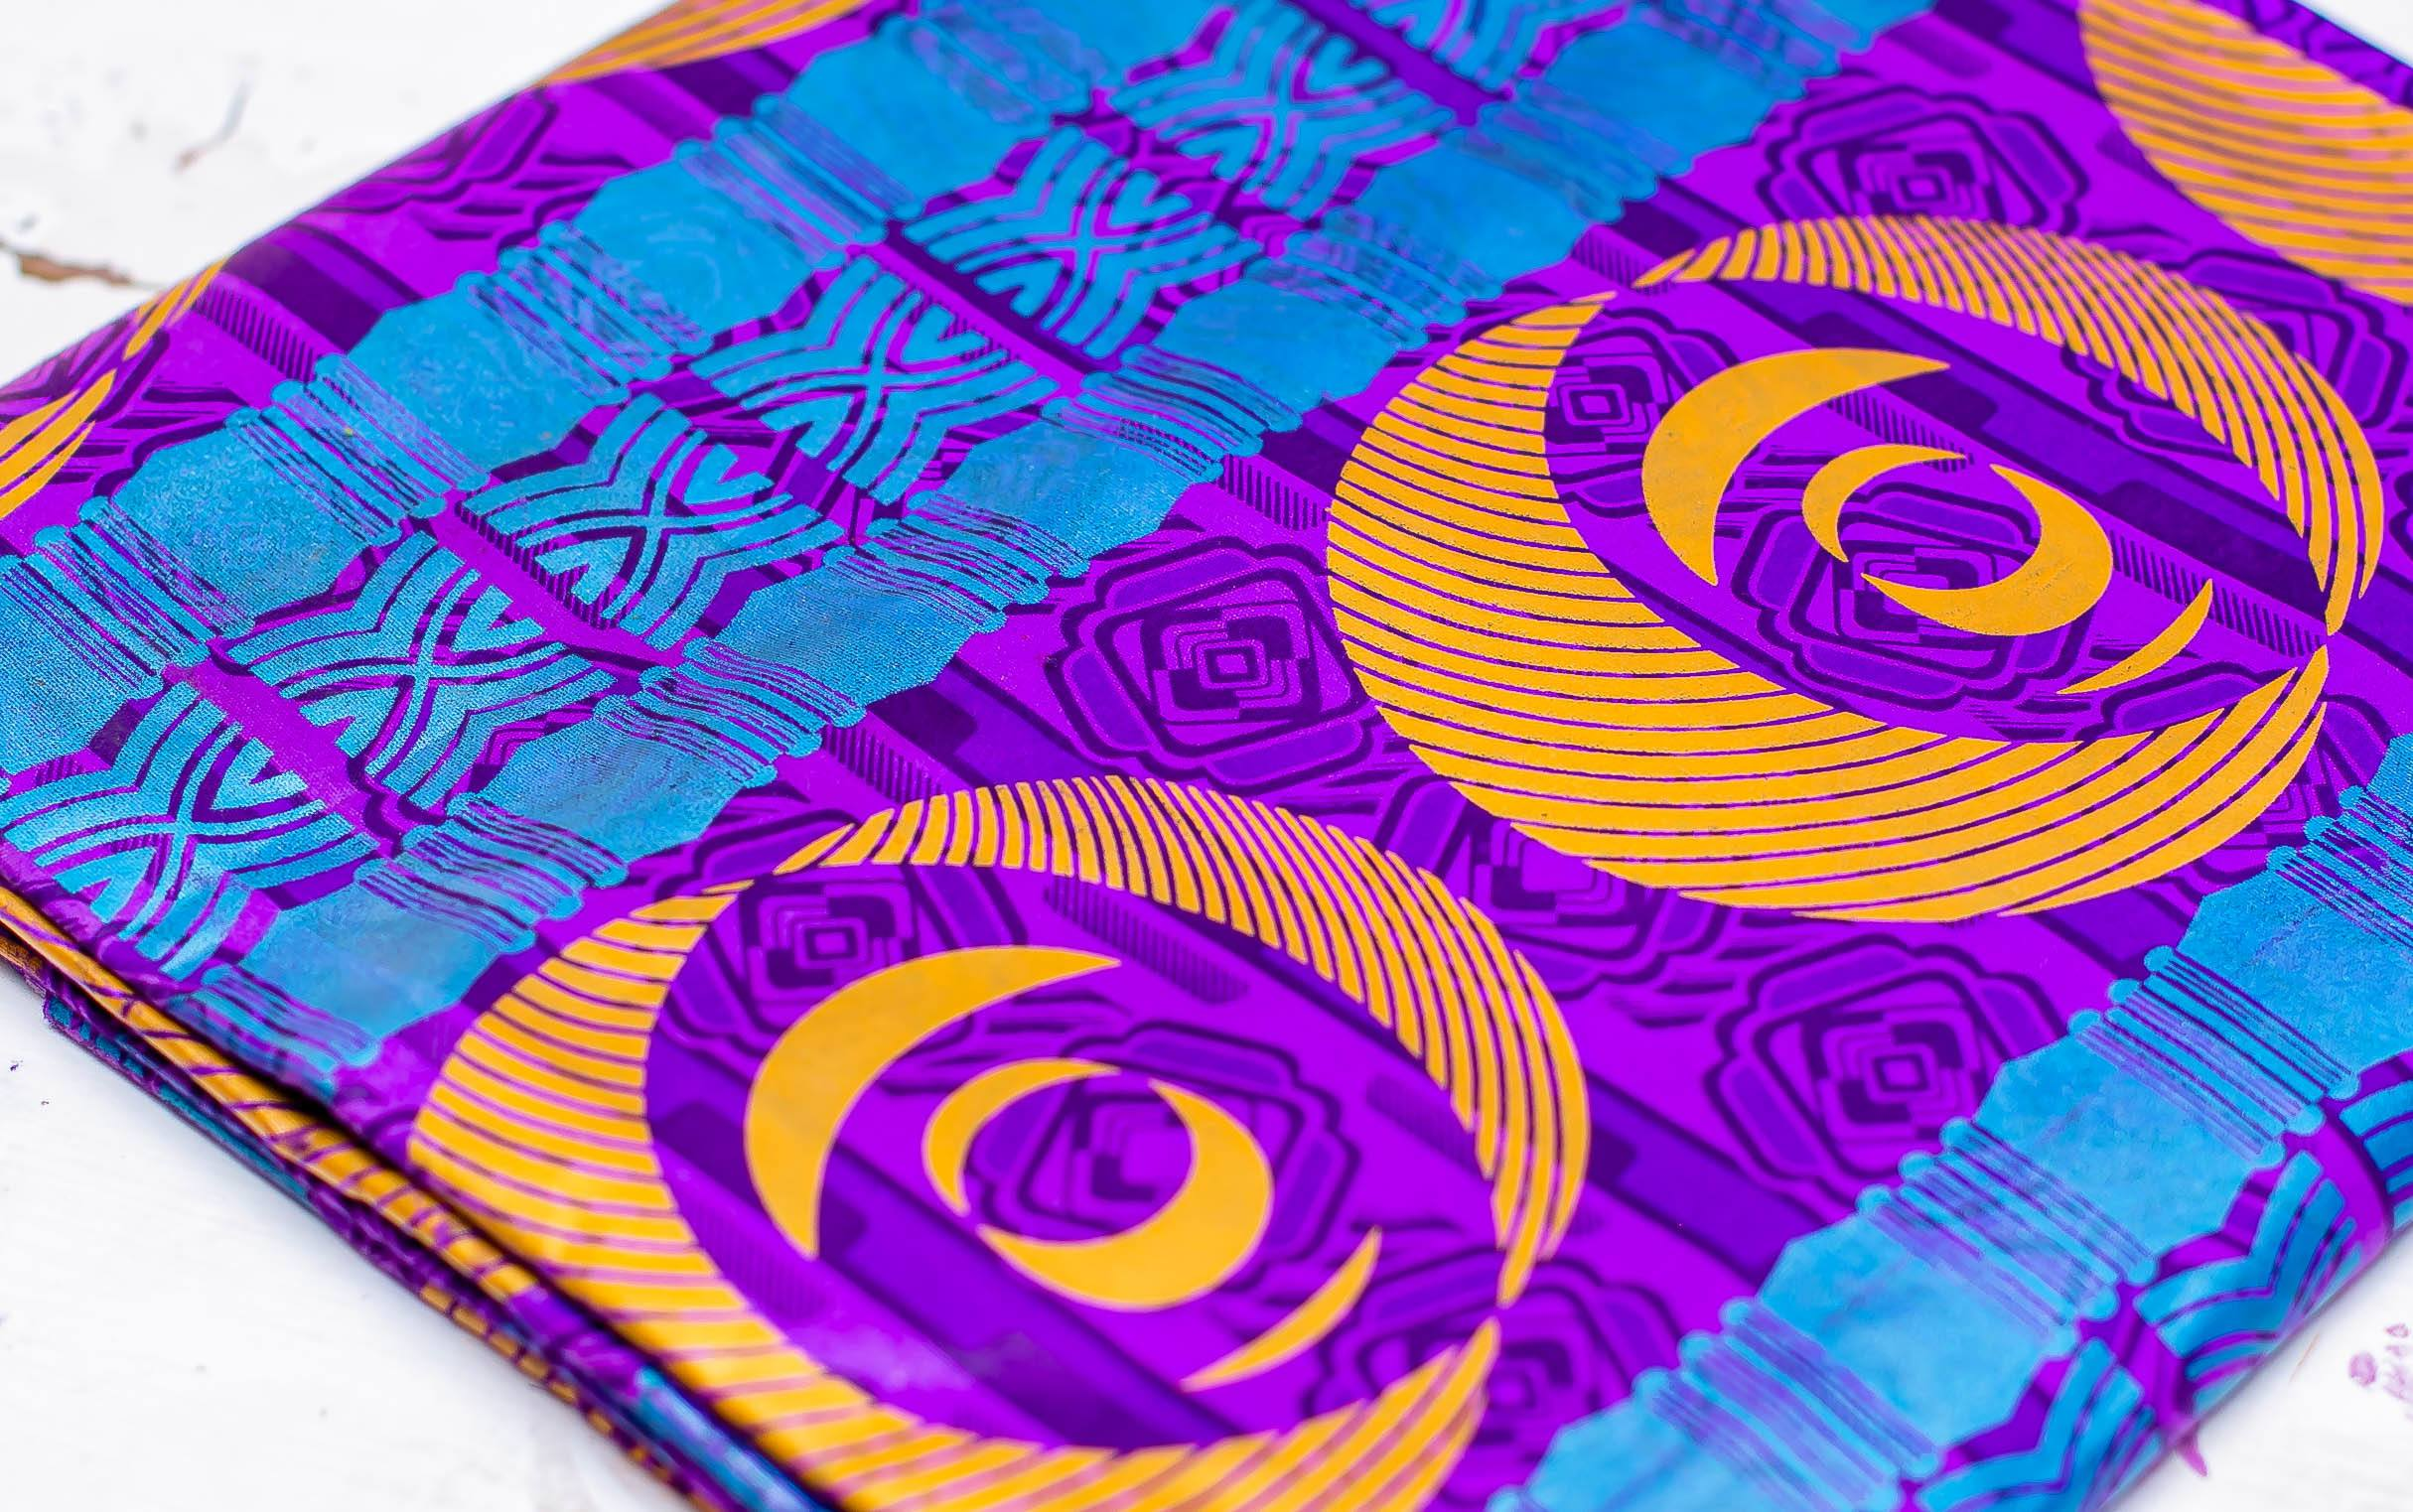 Printed Purple and Orange Glitter Mask Kind Shop 4